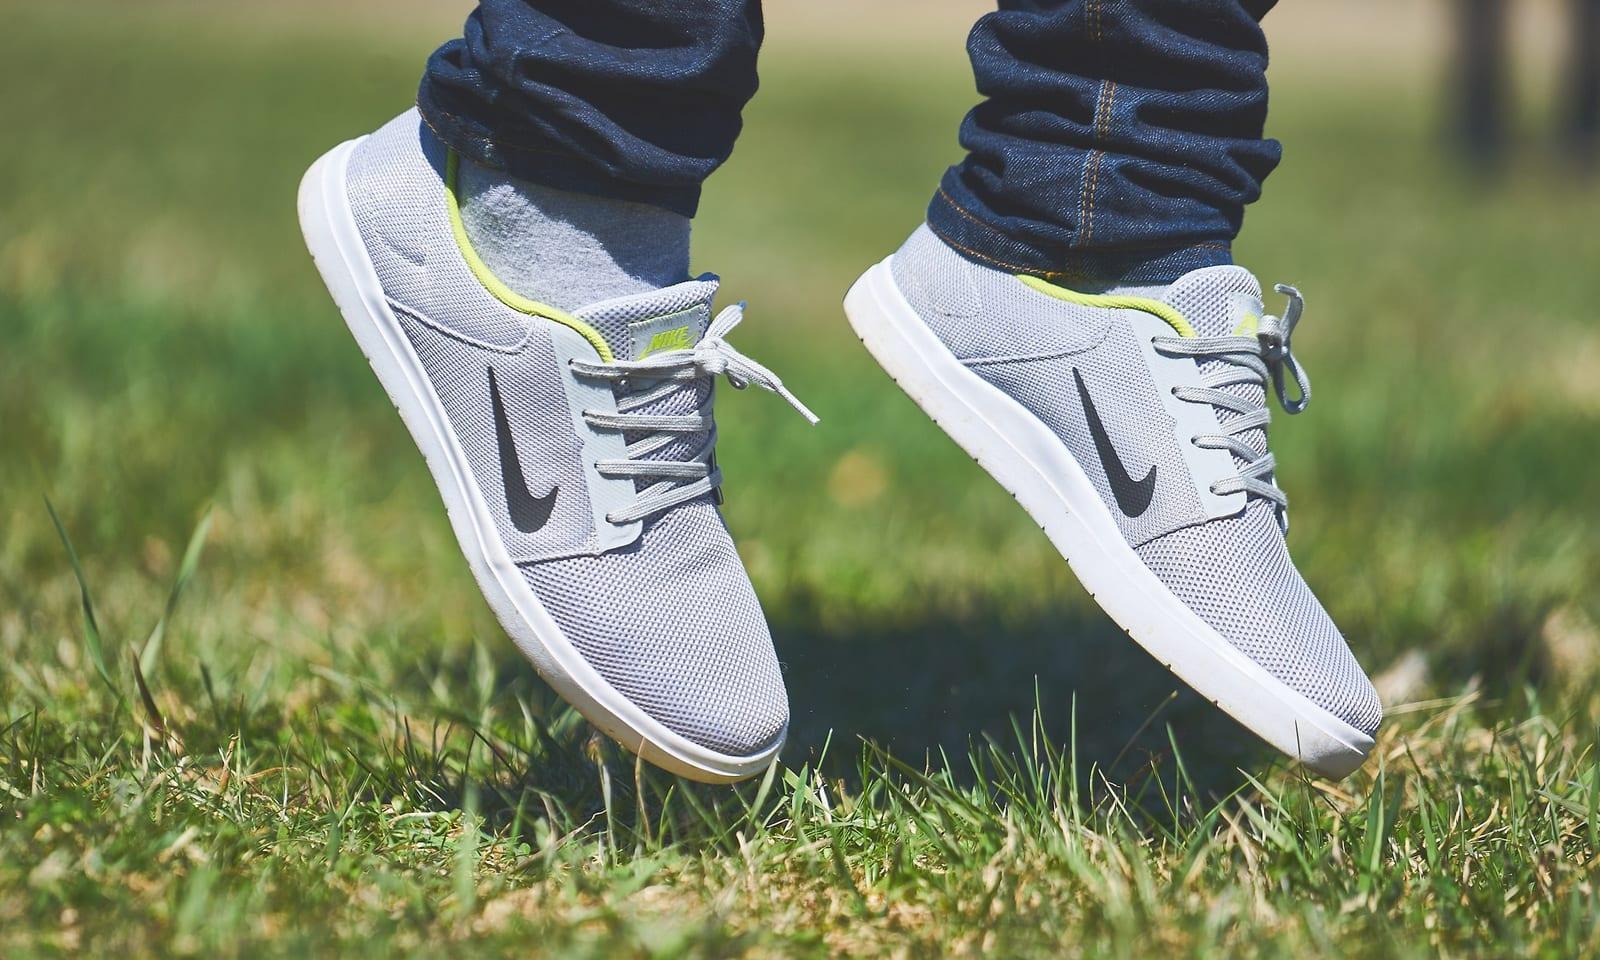 Download Nike Shoes HQ PNG Image | FreePNGImg